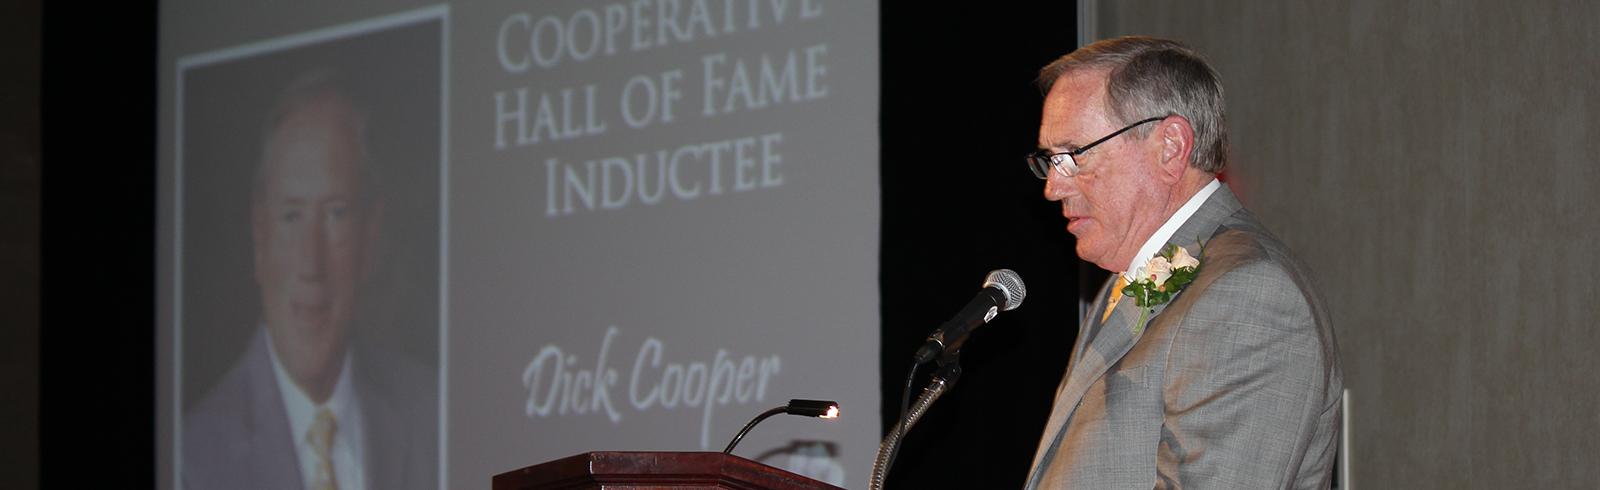 Dick Cooper